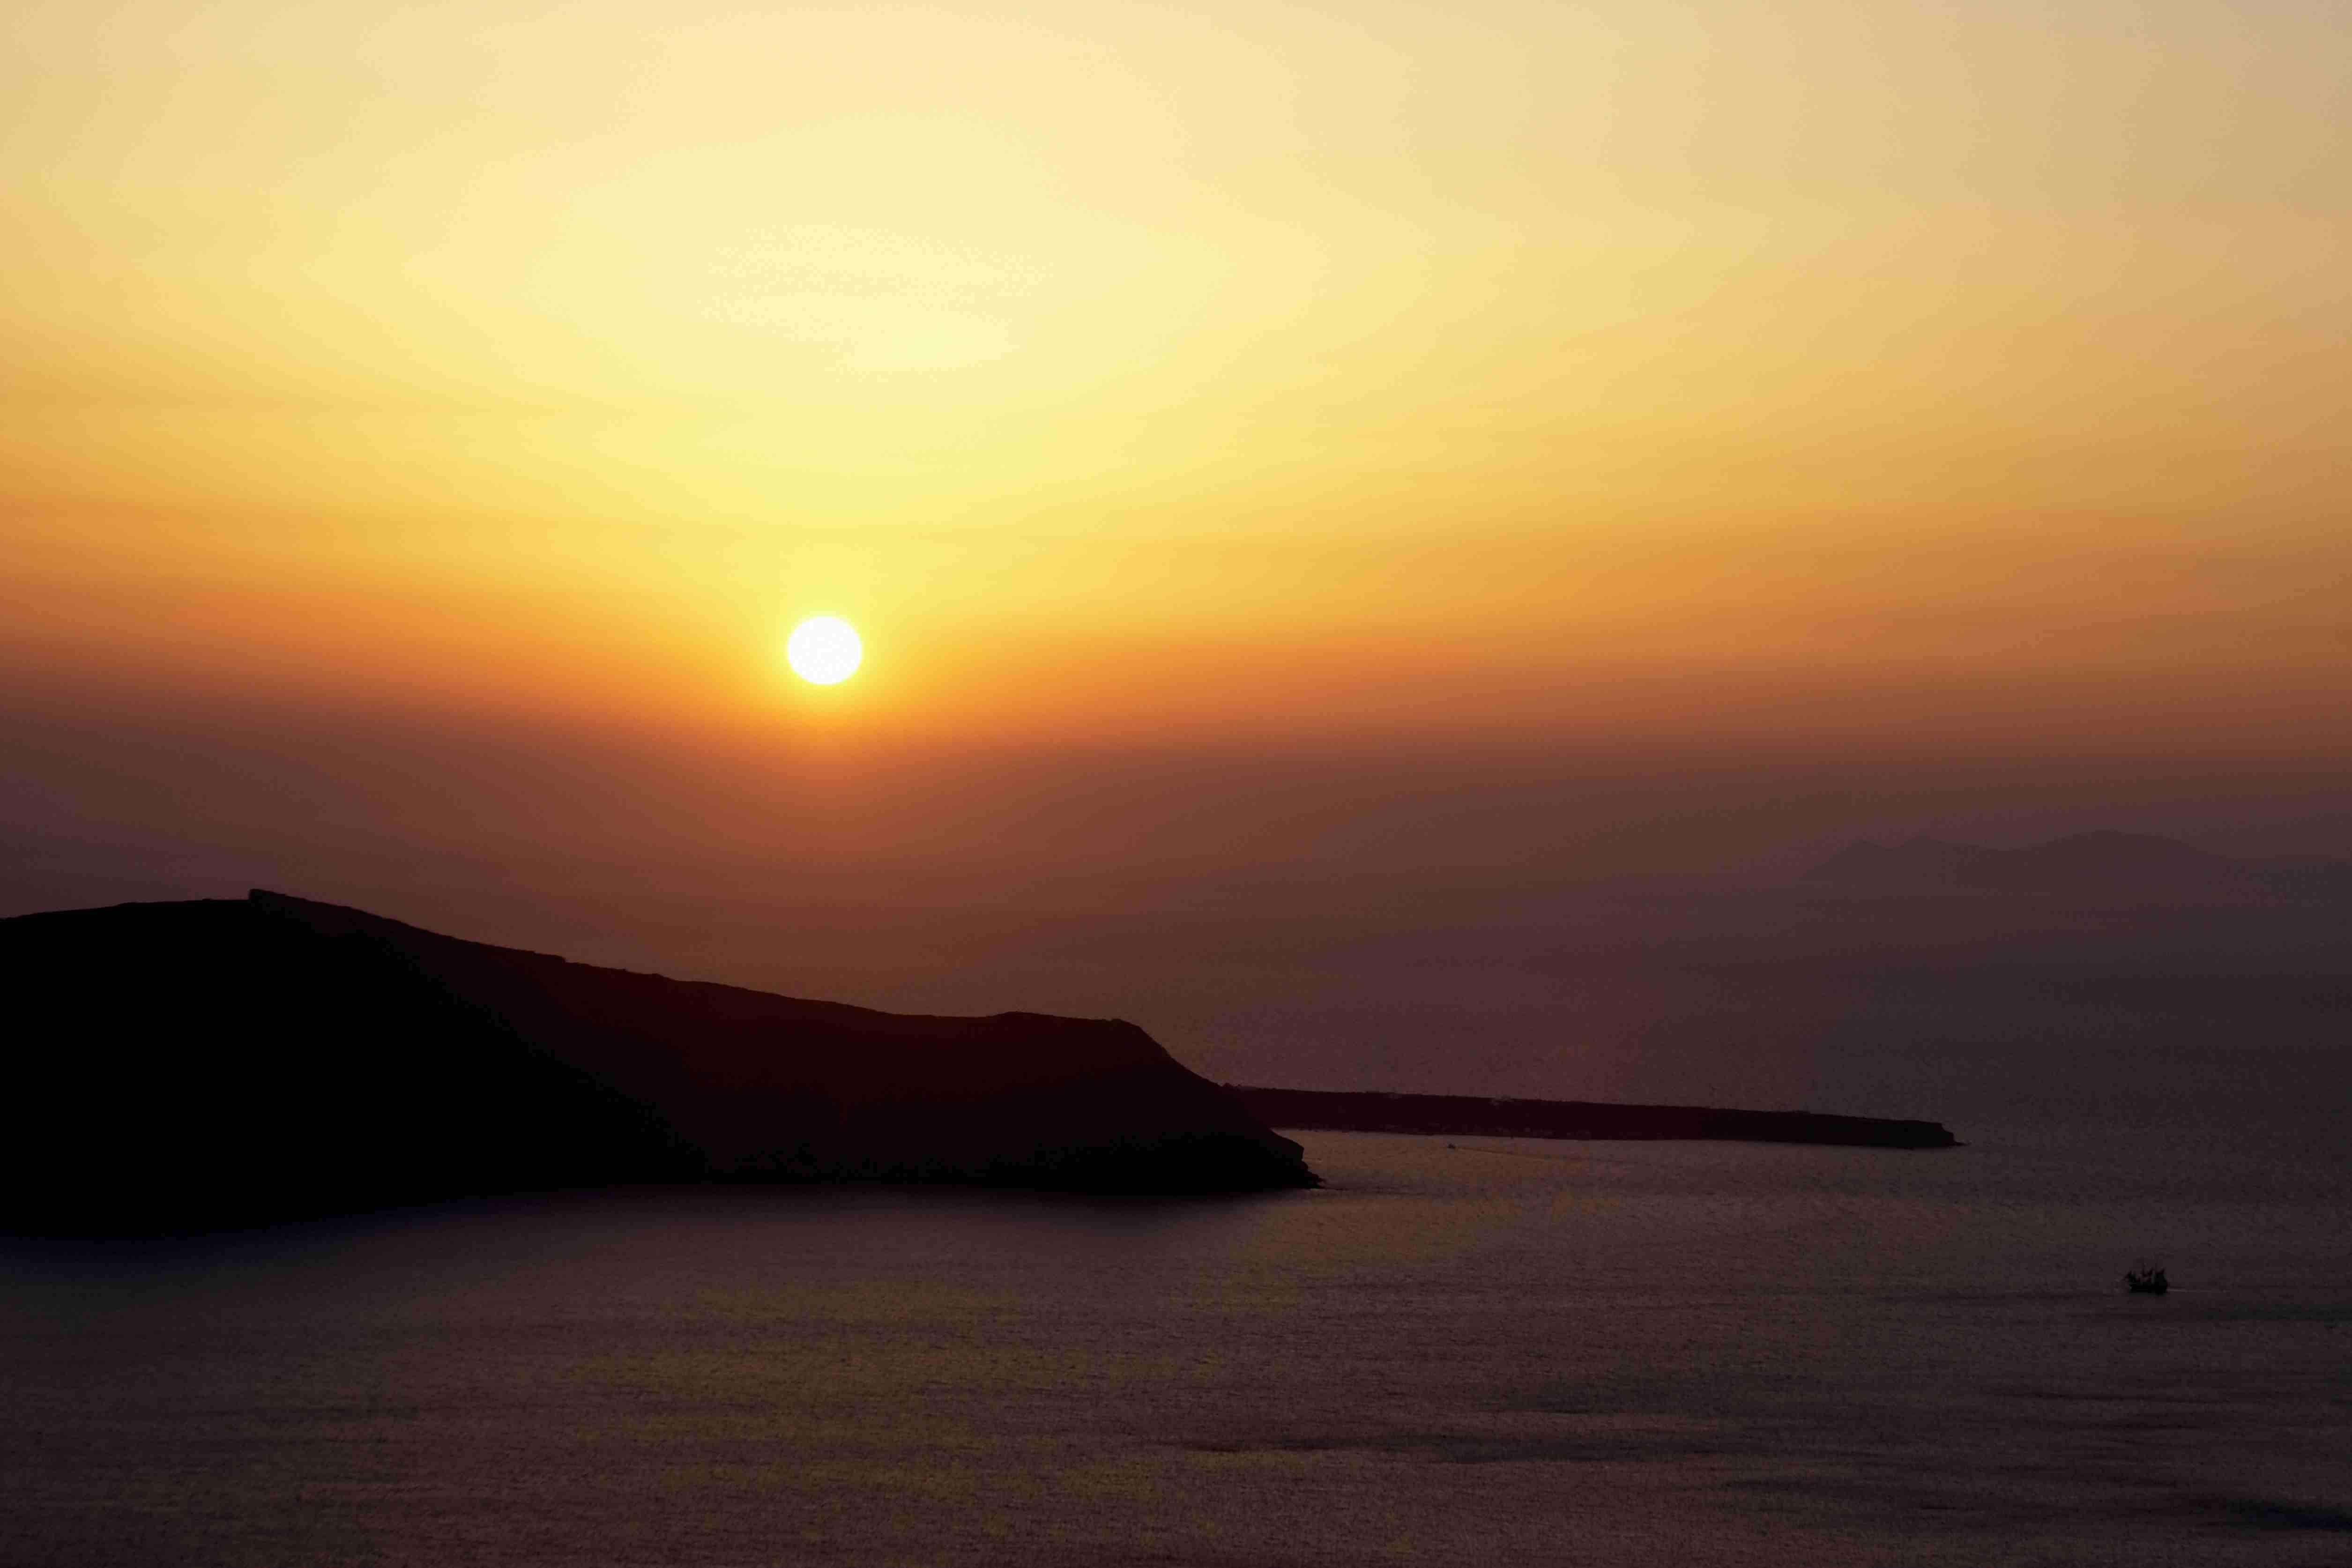 Greece, Thirassia island, sun setting over island